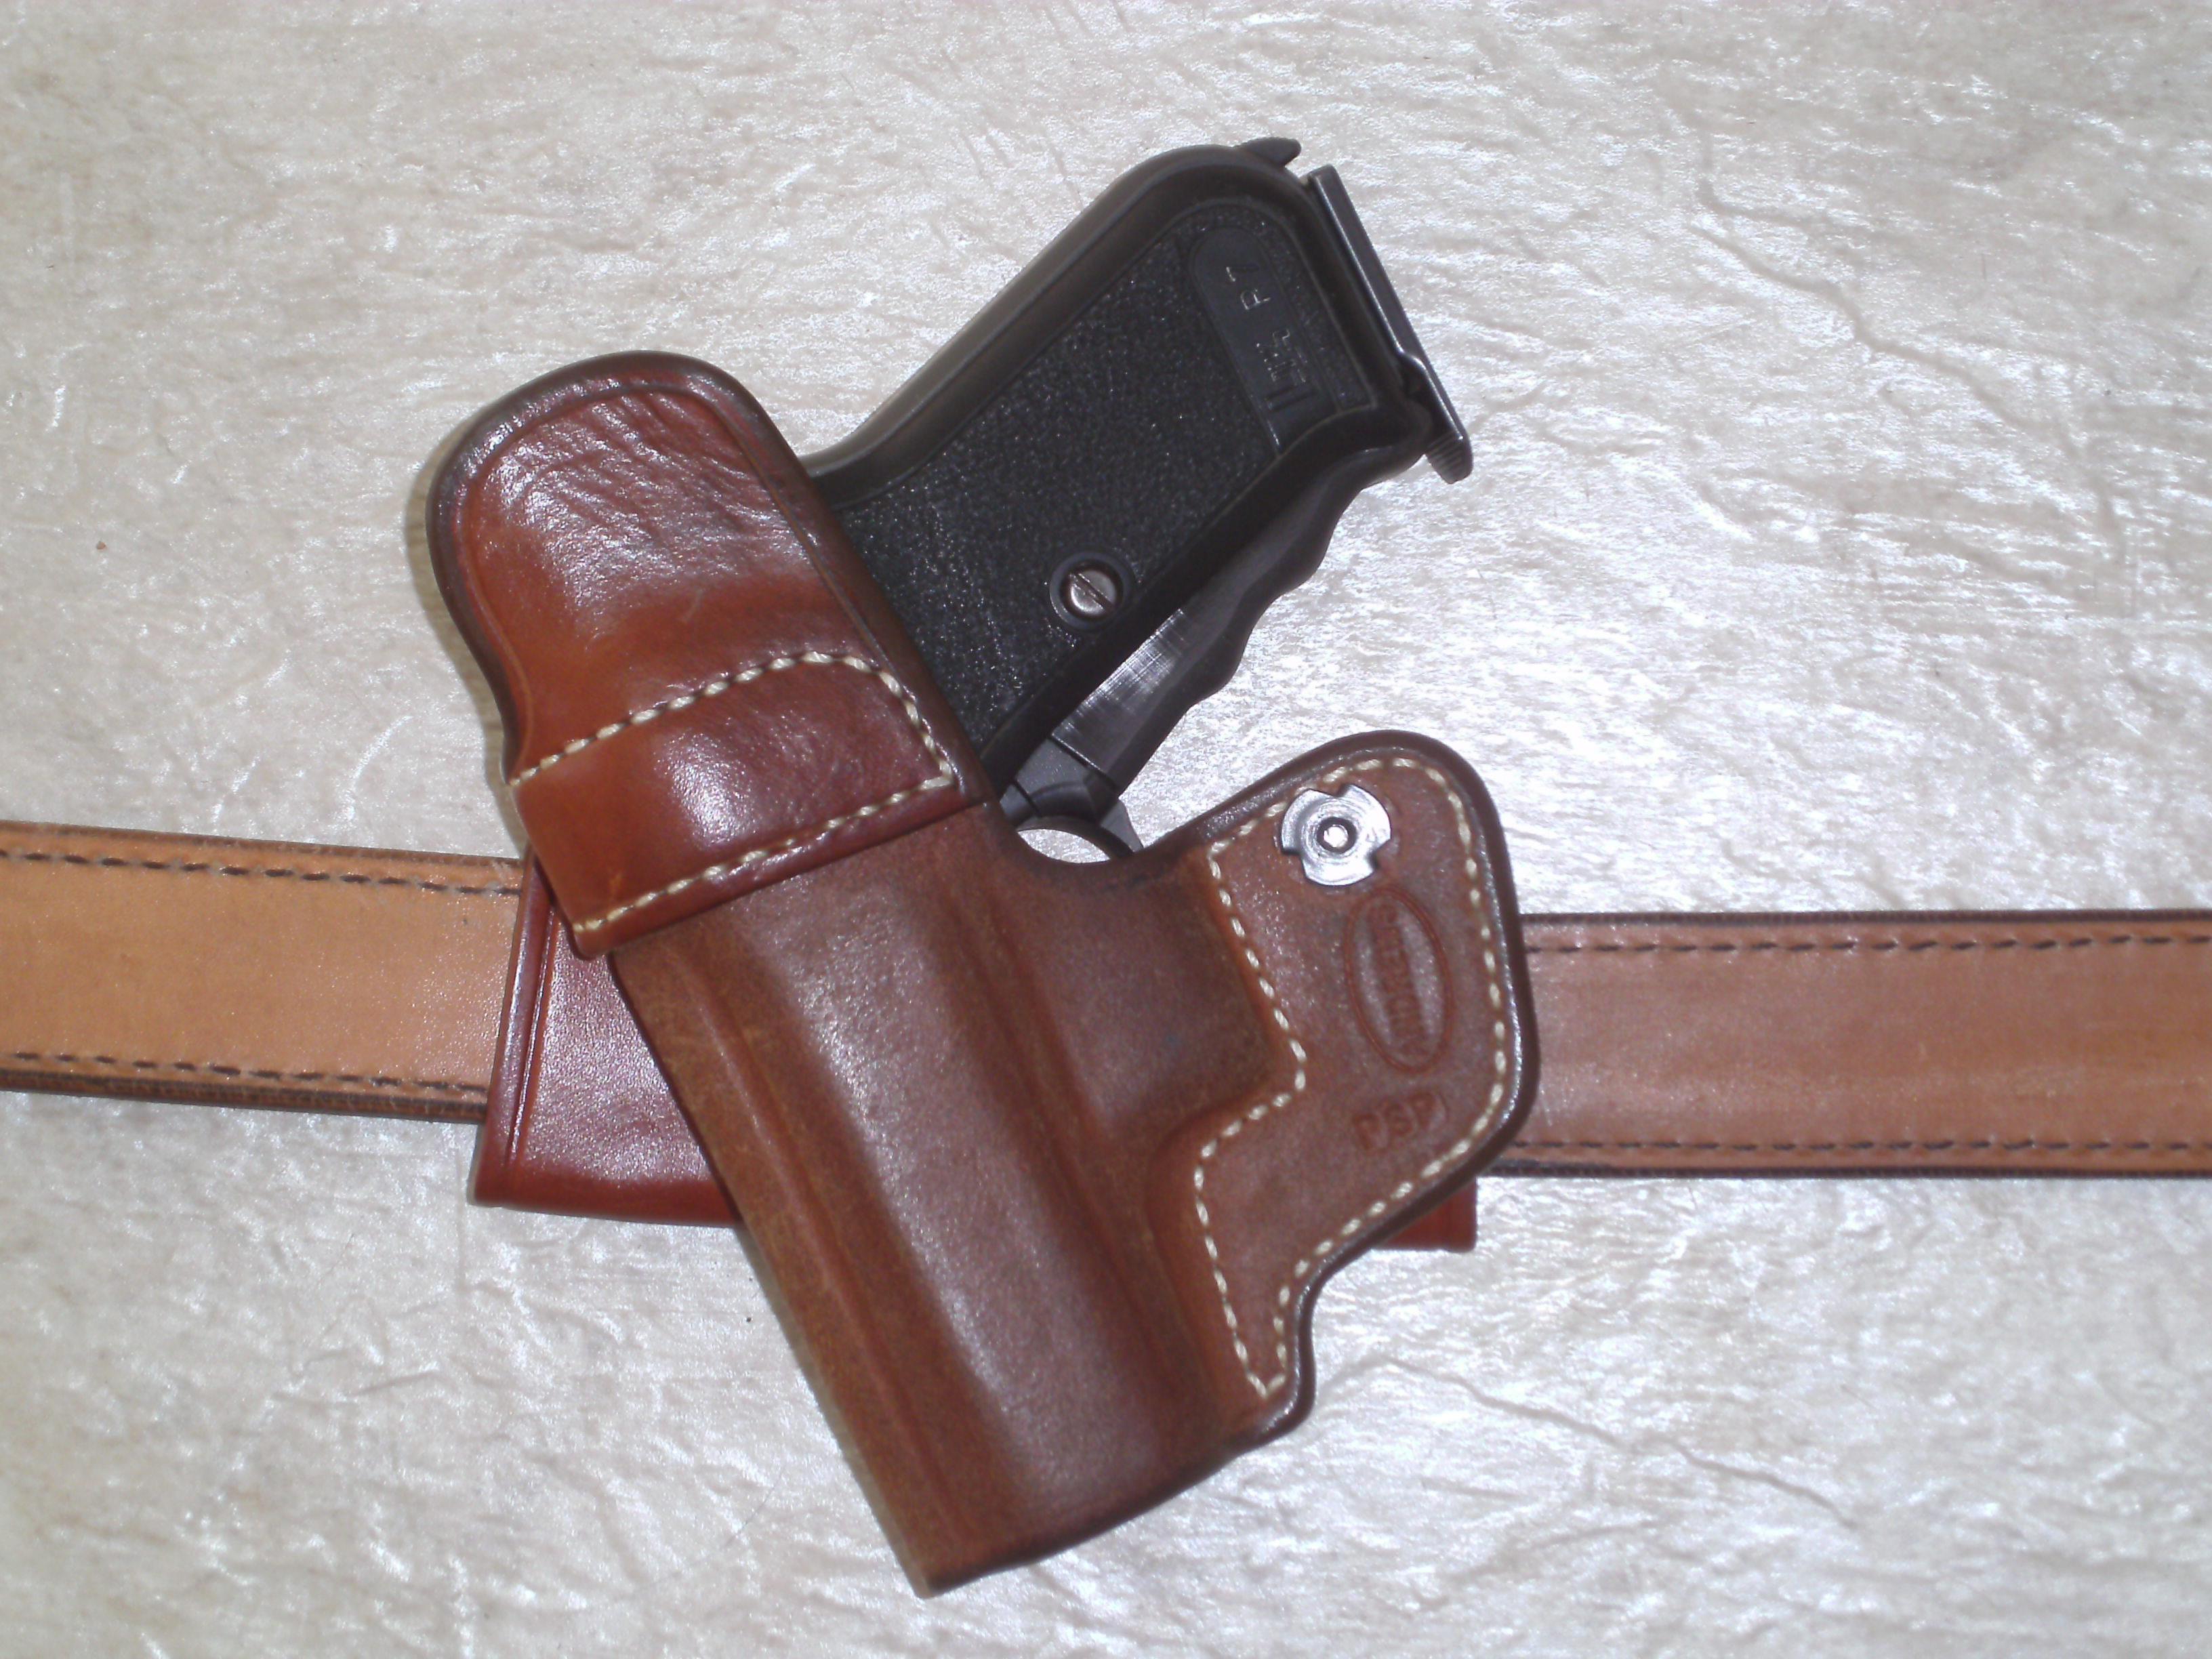 P7 PSP Gunleather for sale-sany1717.jpg